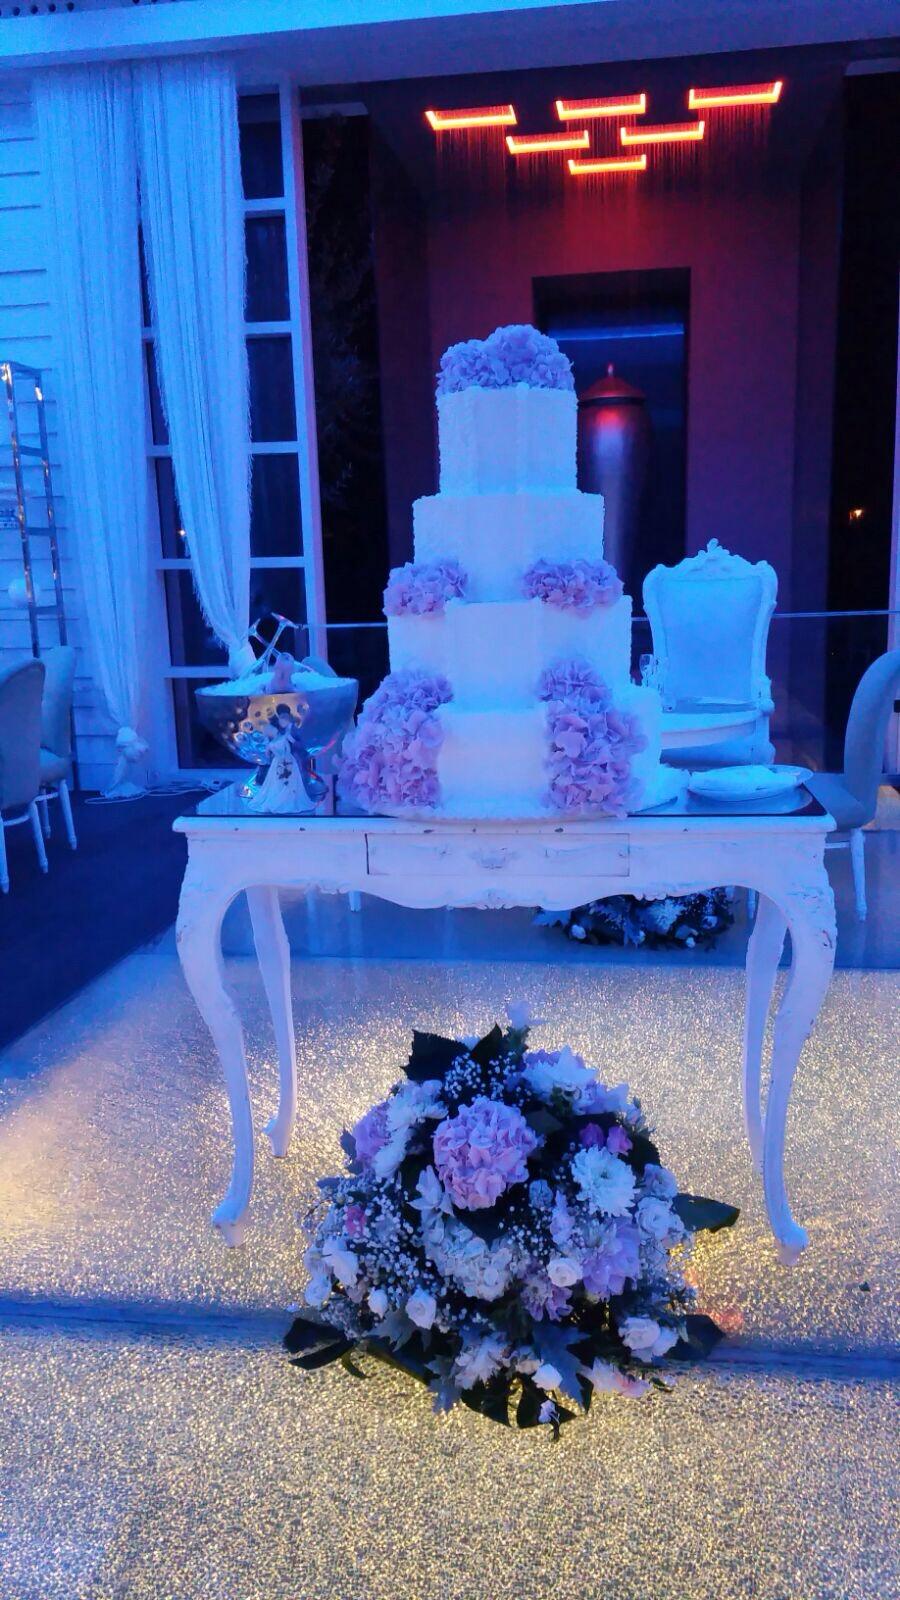 http://www.weddingamalfi.com/wp-content/uploads/Domenico-and-Maria-wedding-cake.jpg